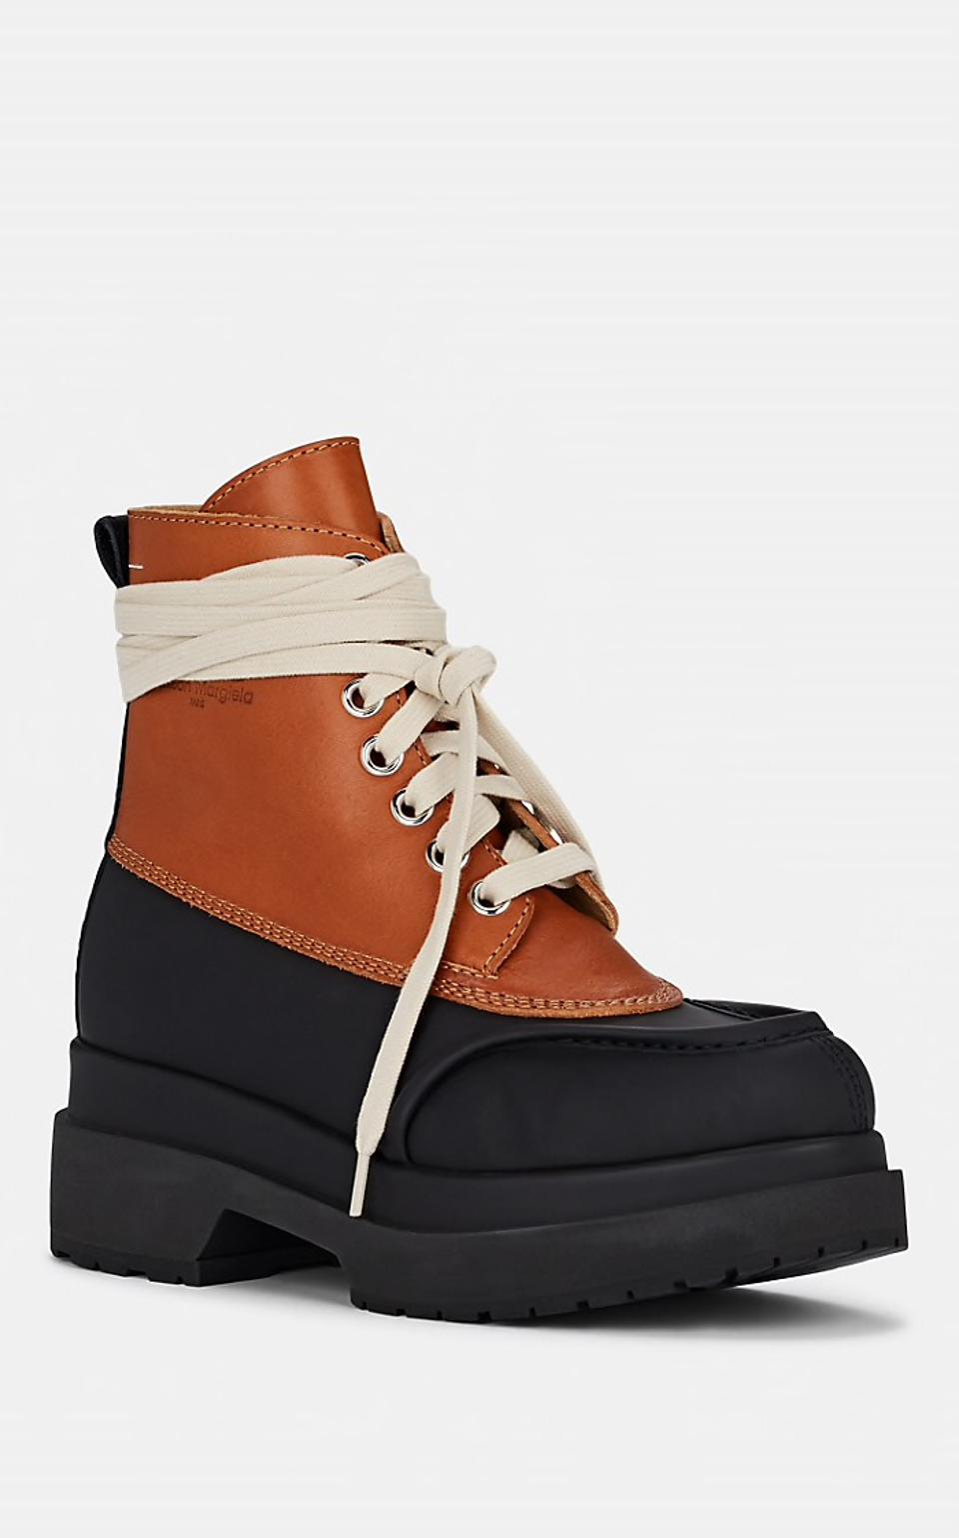 designer cold weather boots